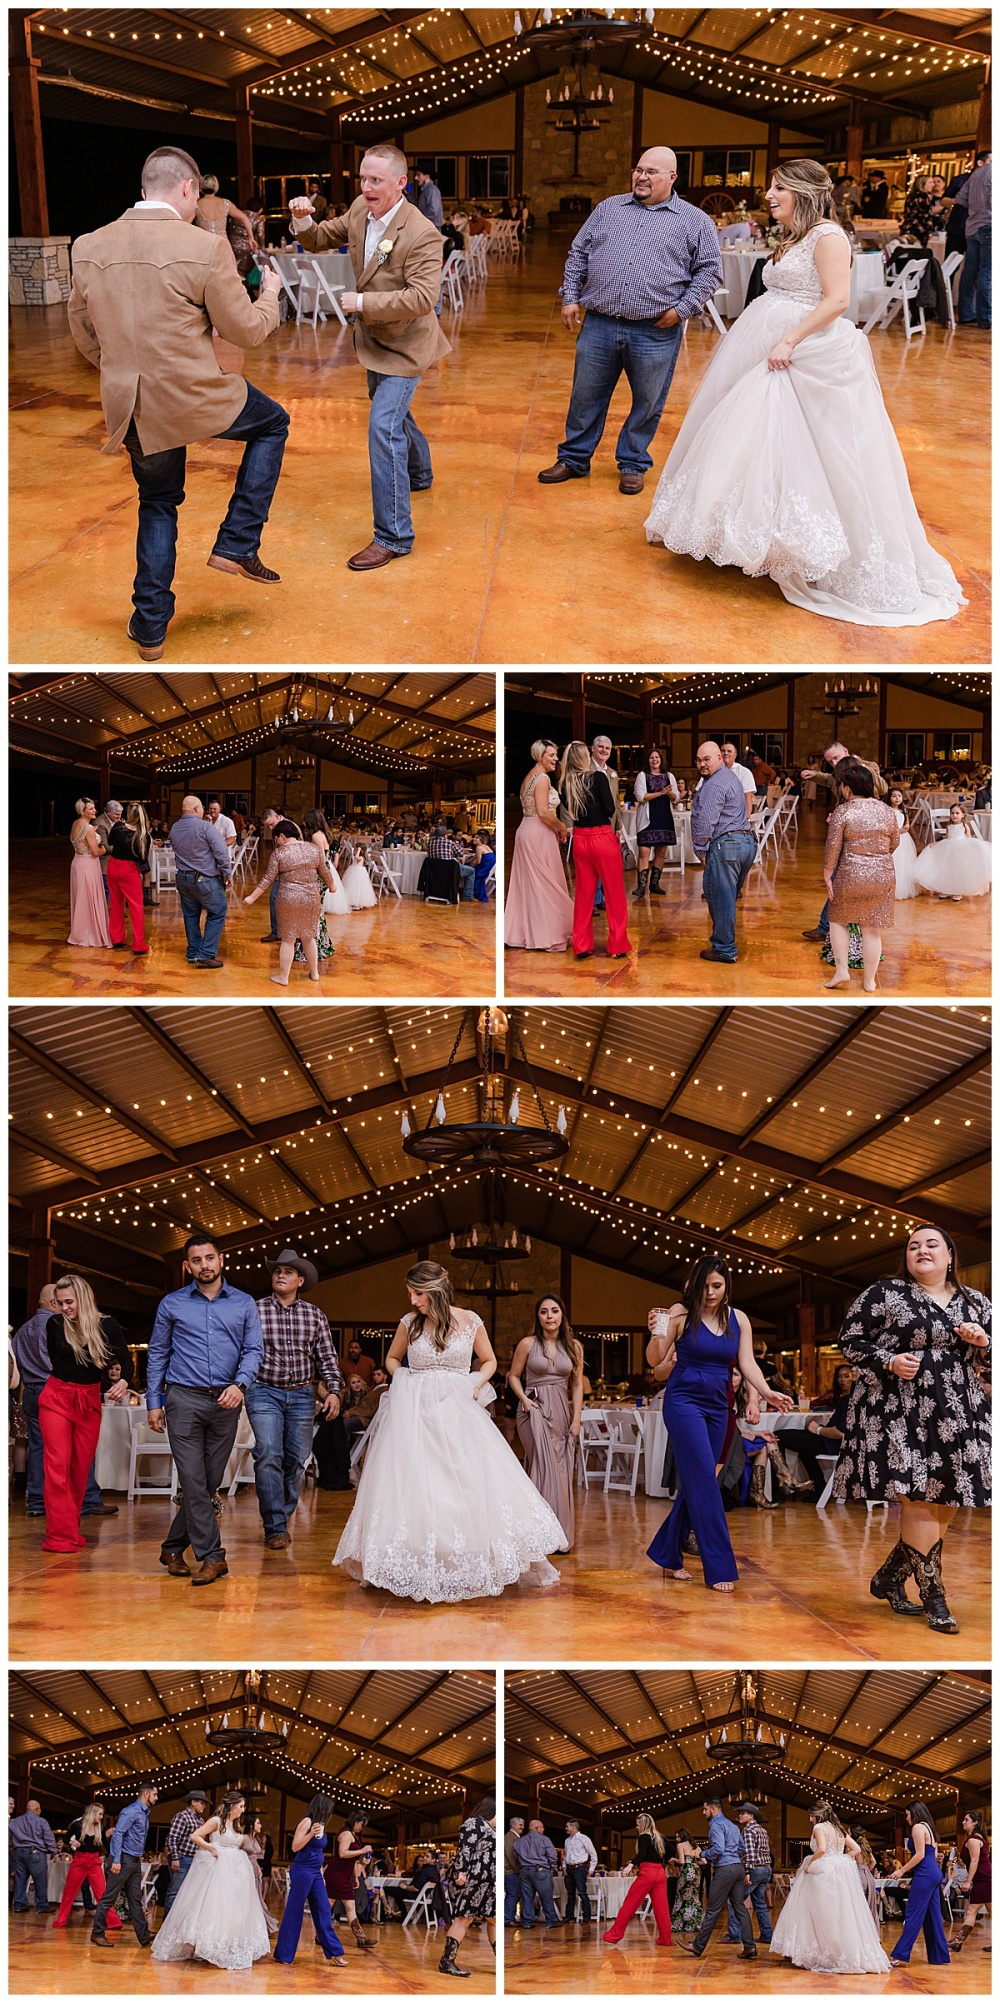 Wedding-Photographer-Texas-Hill-Country-Happy-H-Ranch-Comfor-Texas-Carly-Barton-Photography_0090.jpg